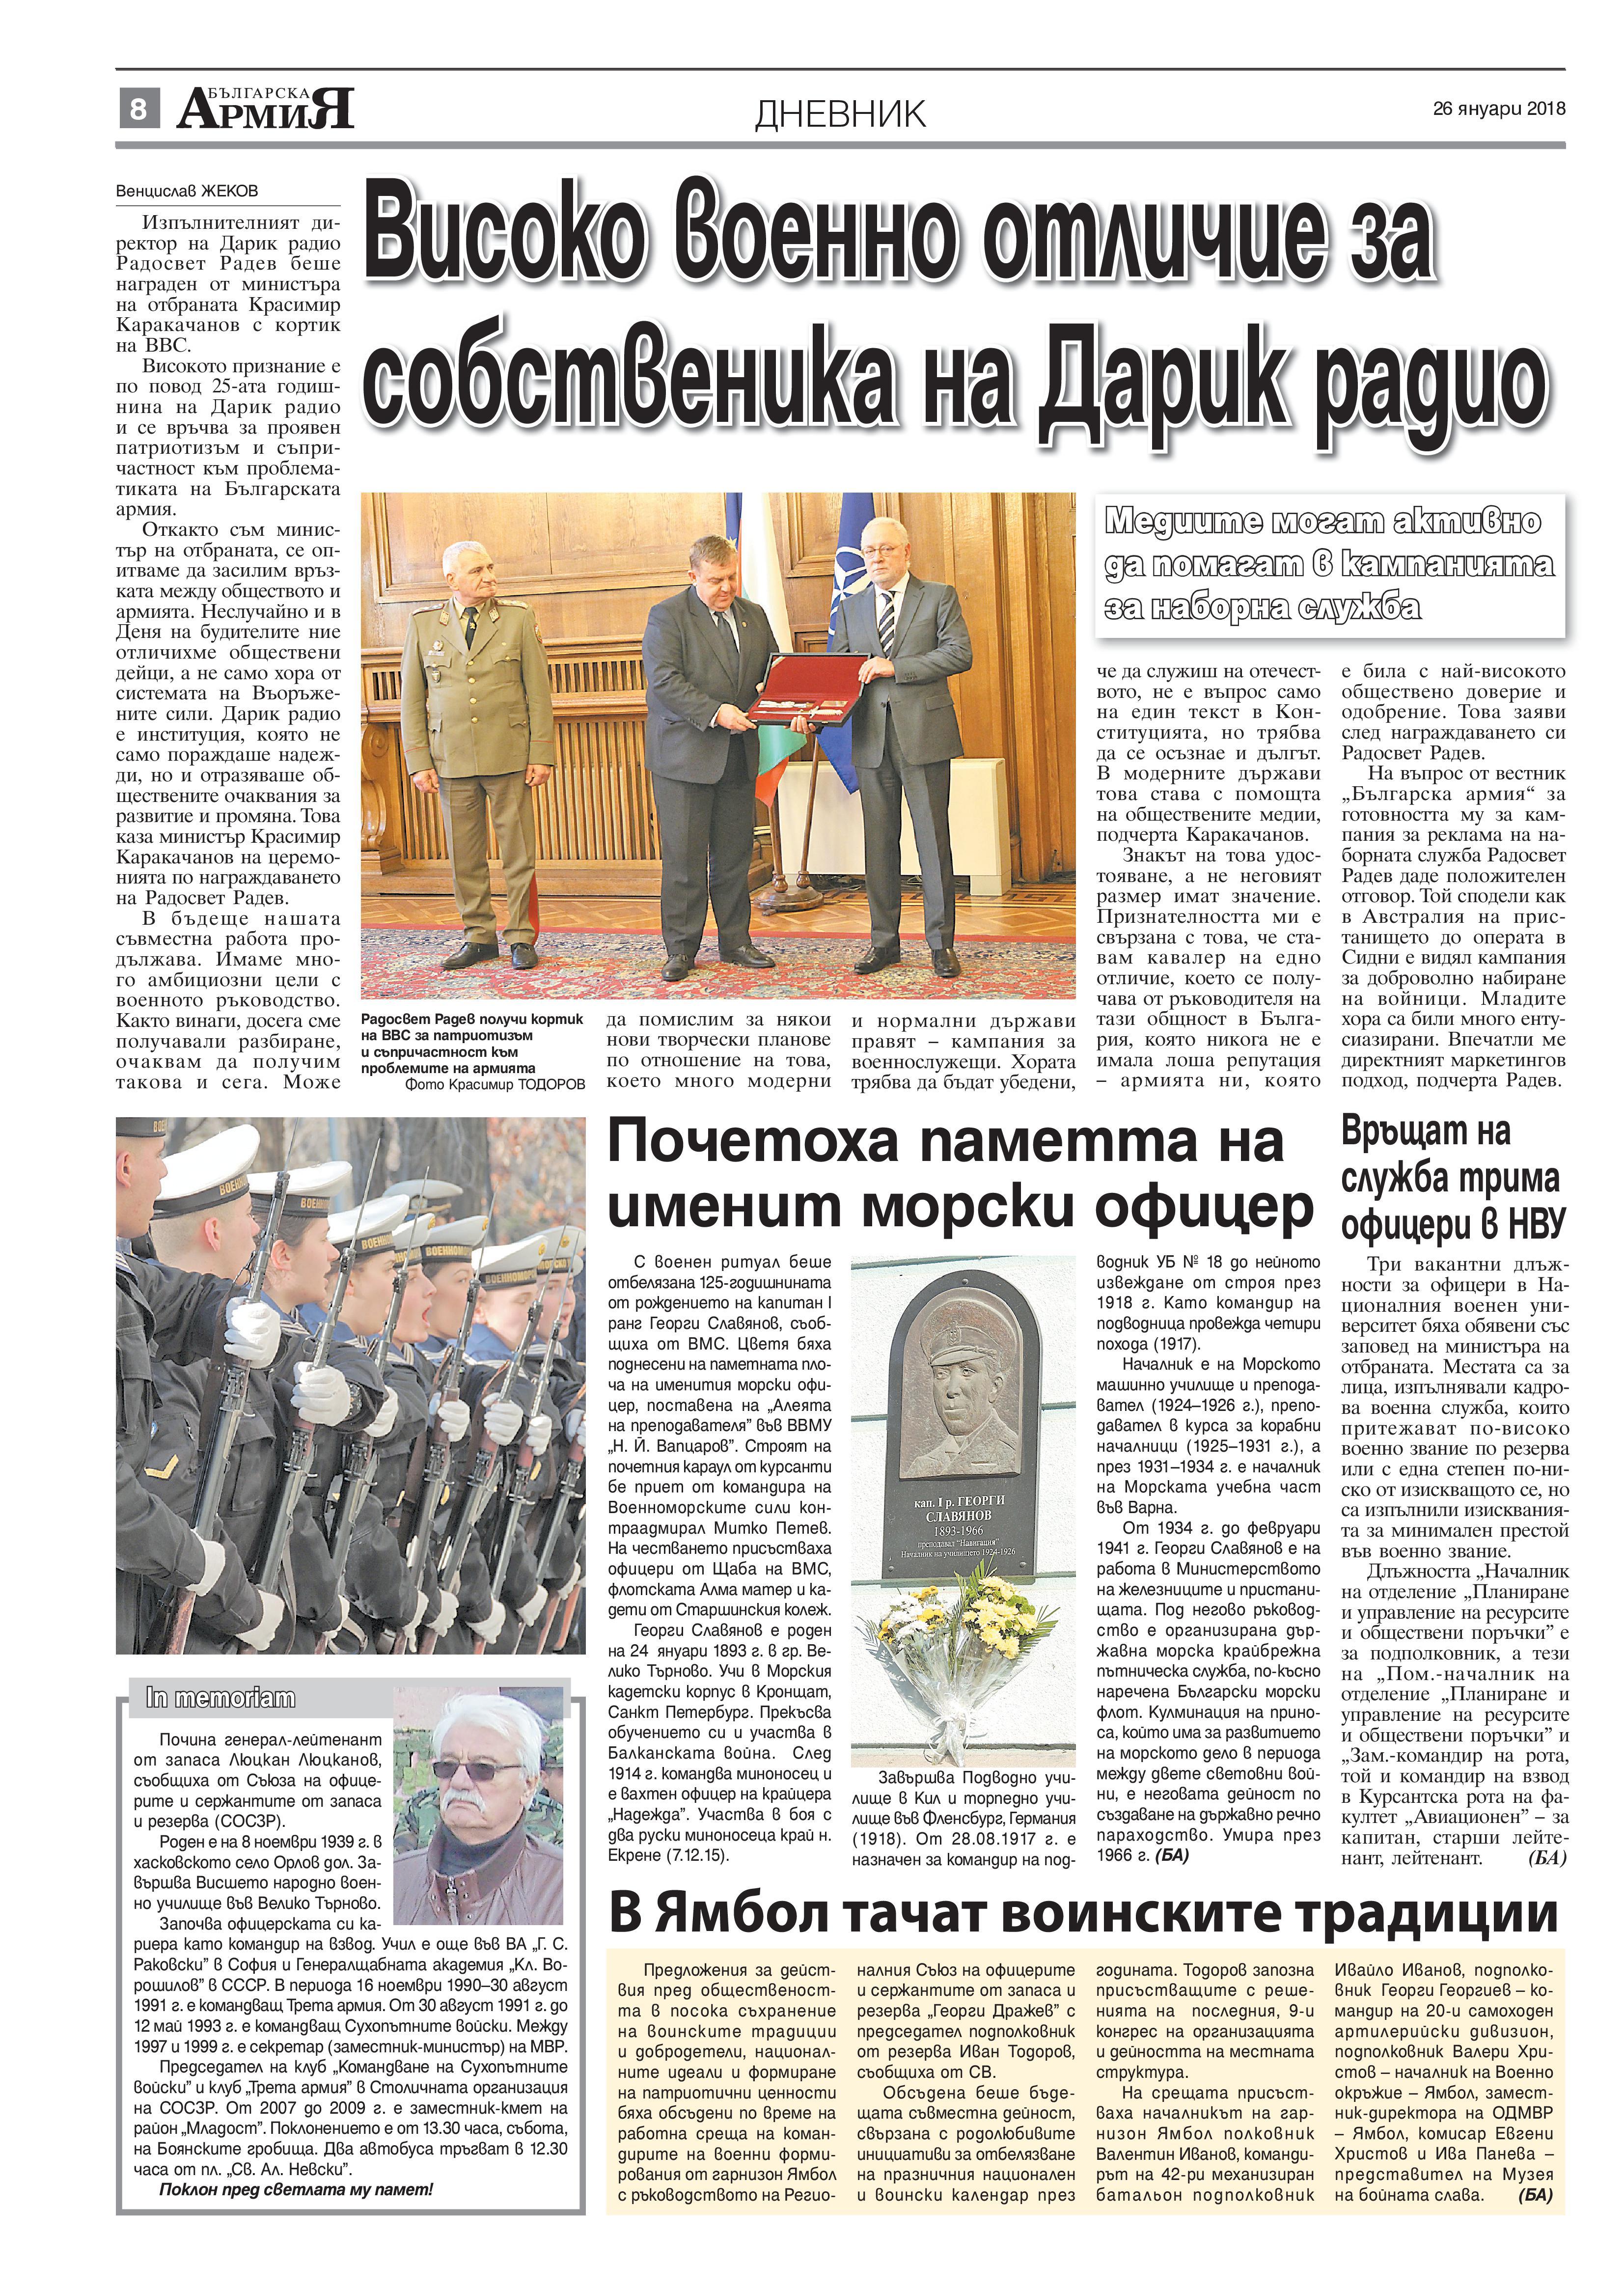 http://armymedia.bg/wp-content/uploads/2015/06/08-17.jpg